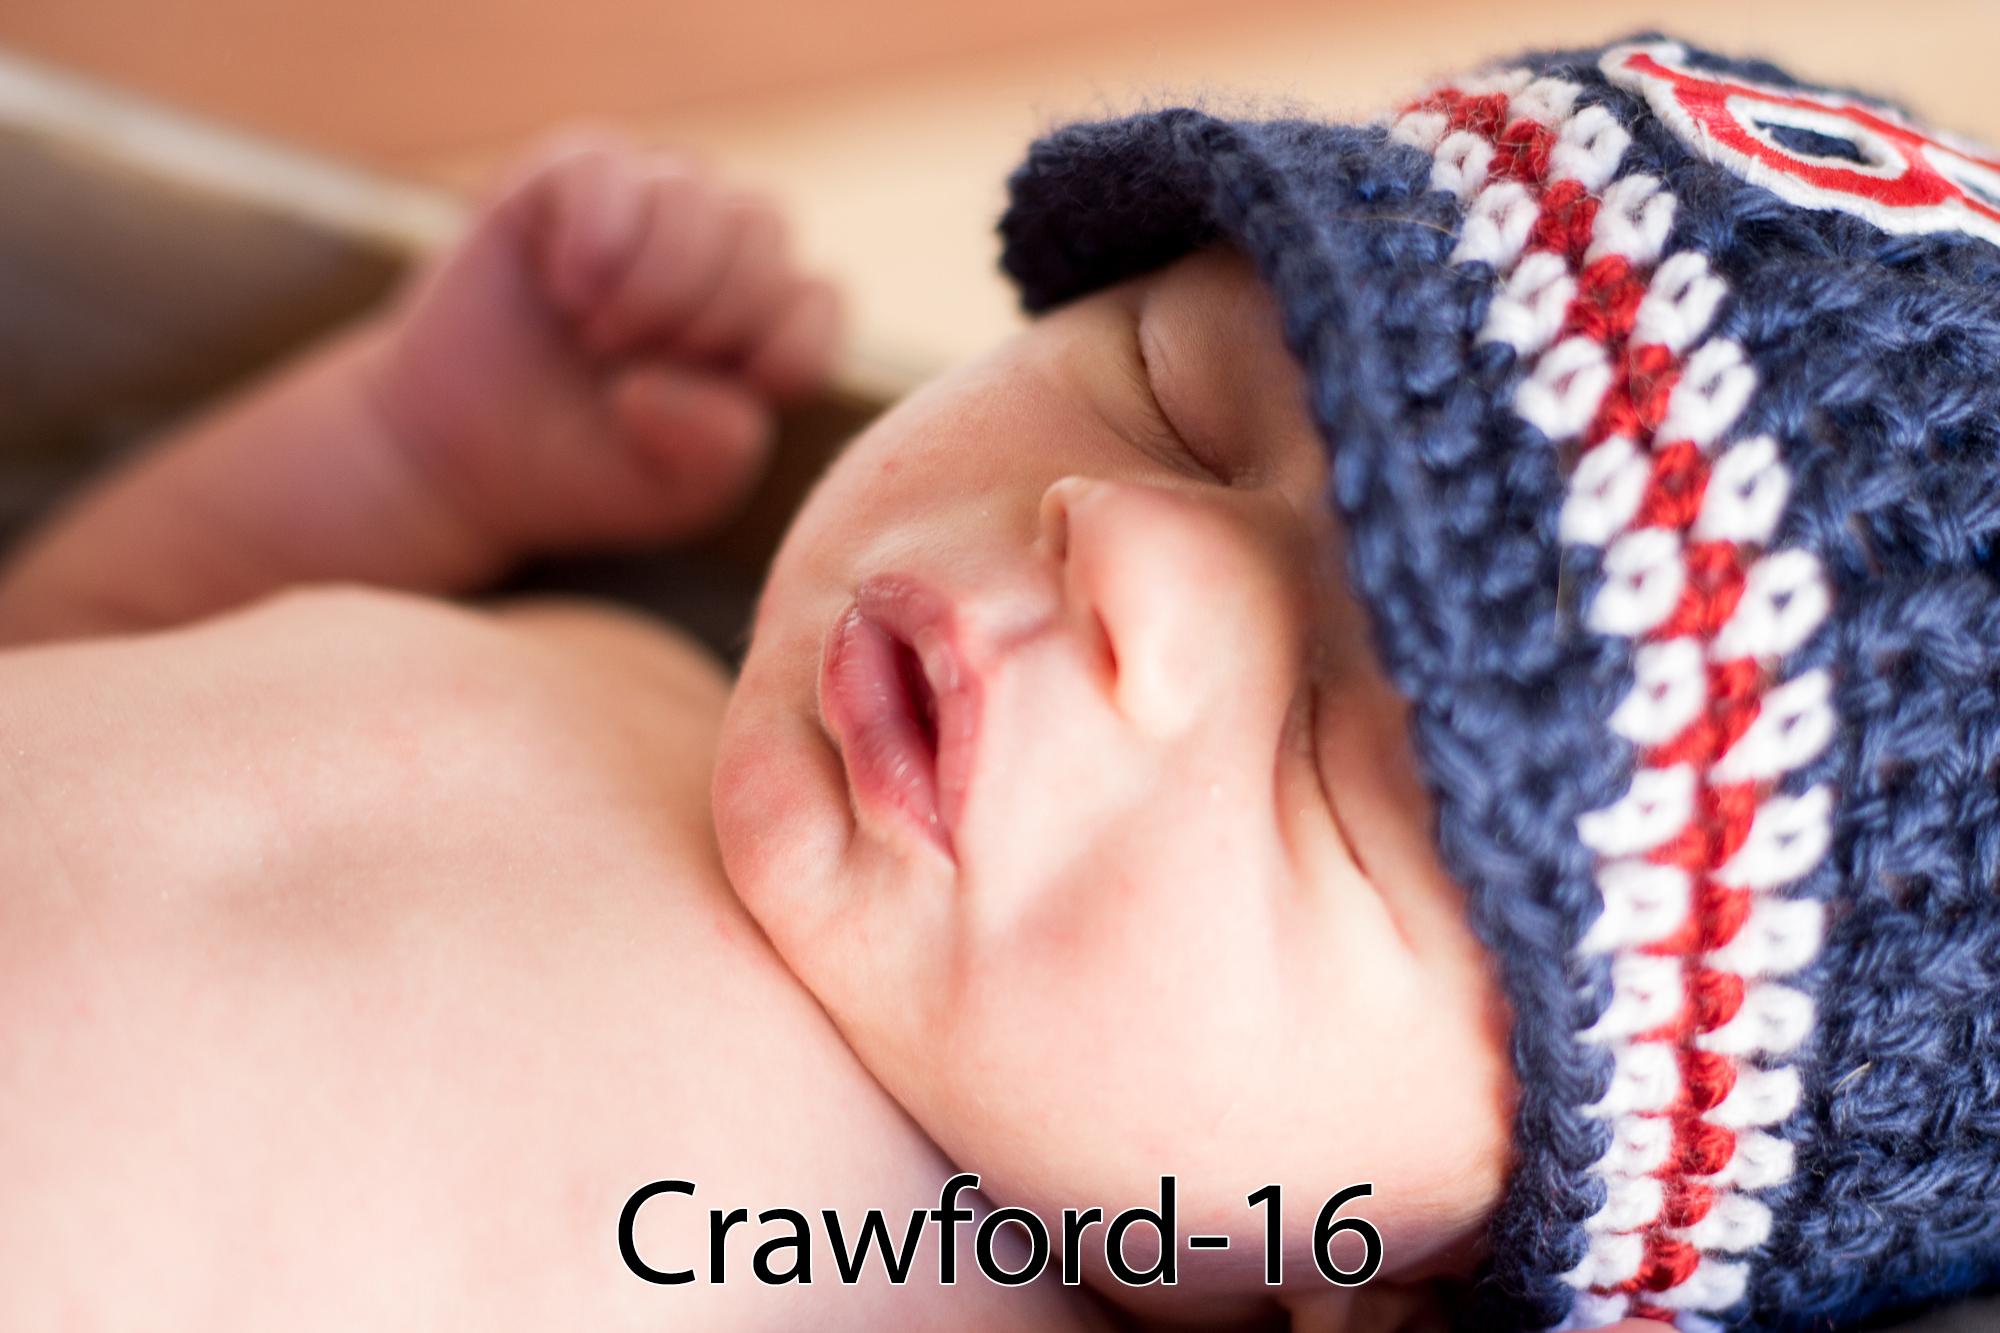 Crawford-16.jpg